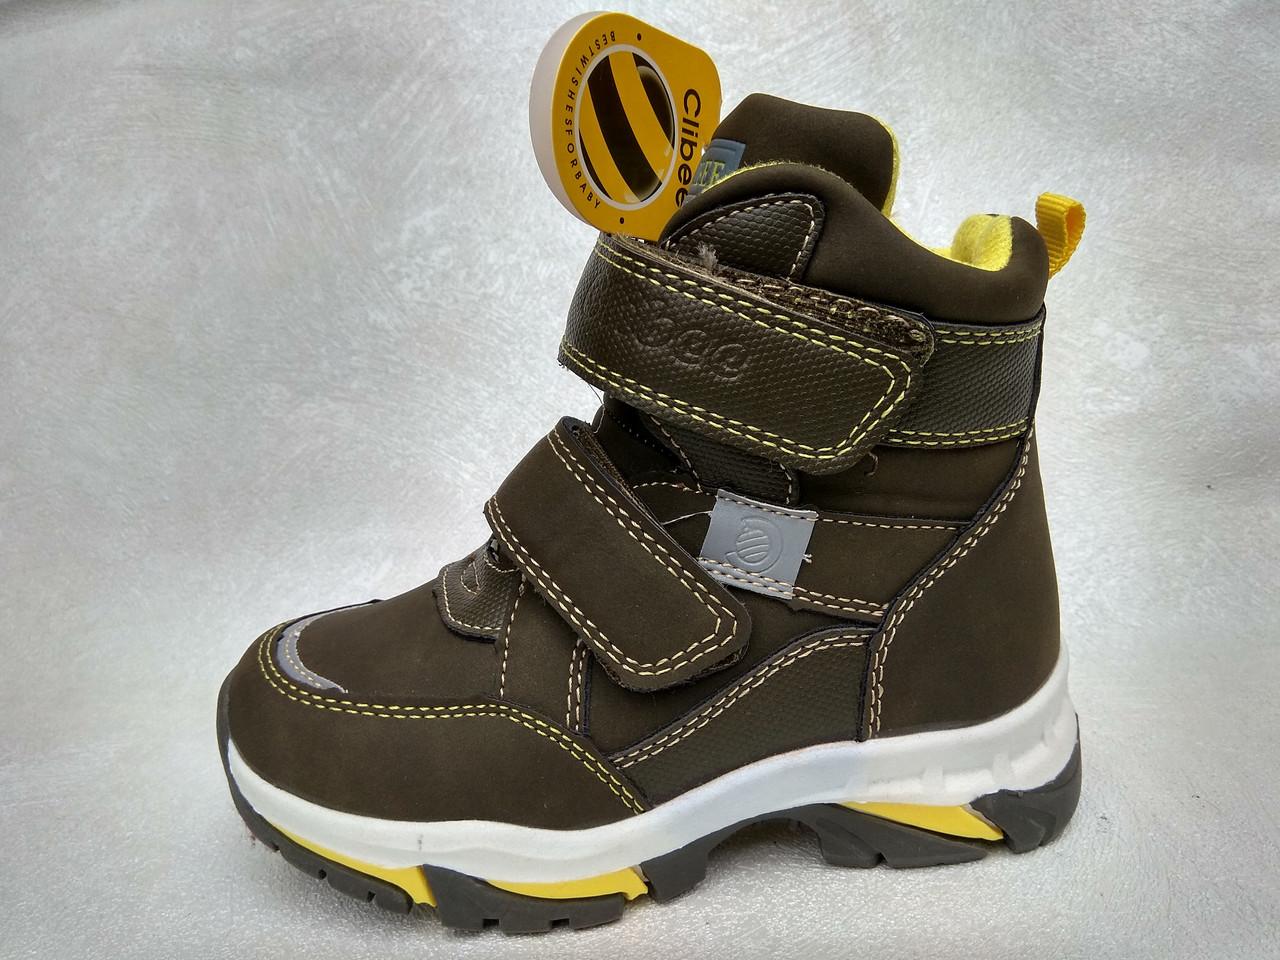 2a25321bd3e129 Зимние ботинки для мальчиков Clibee (р.26-31), цена 416,87 грн ...